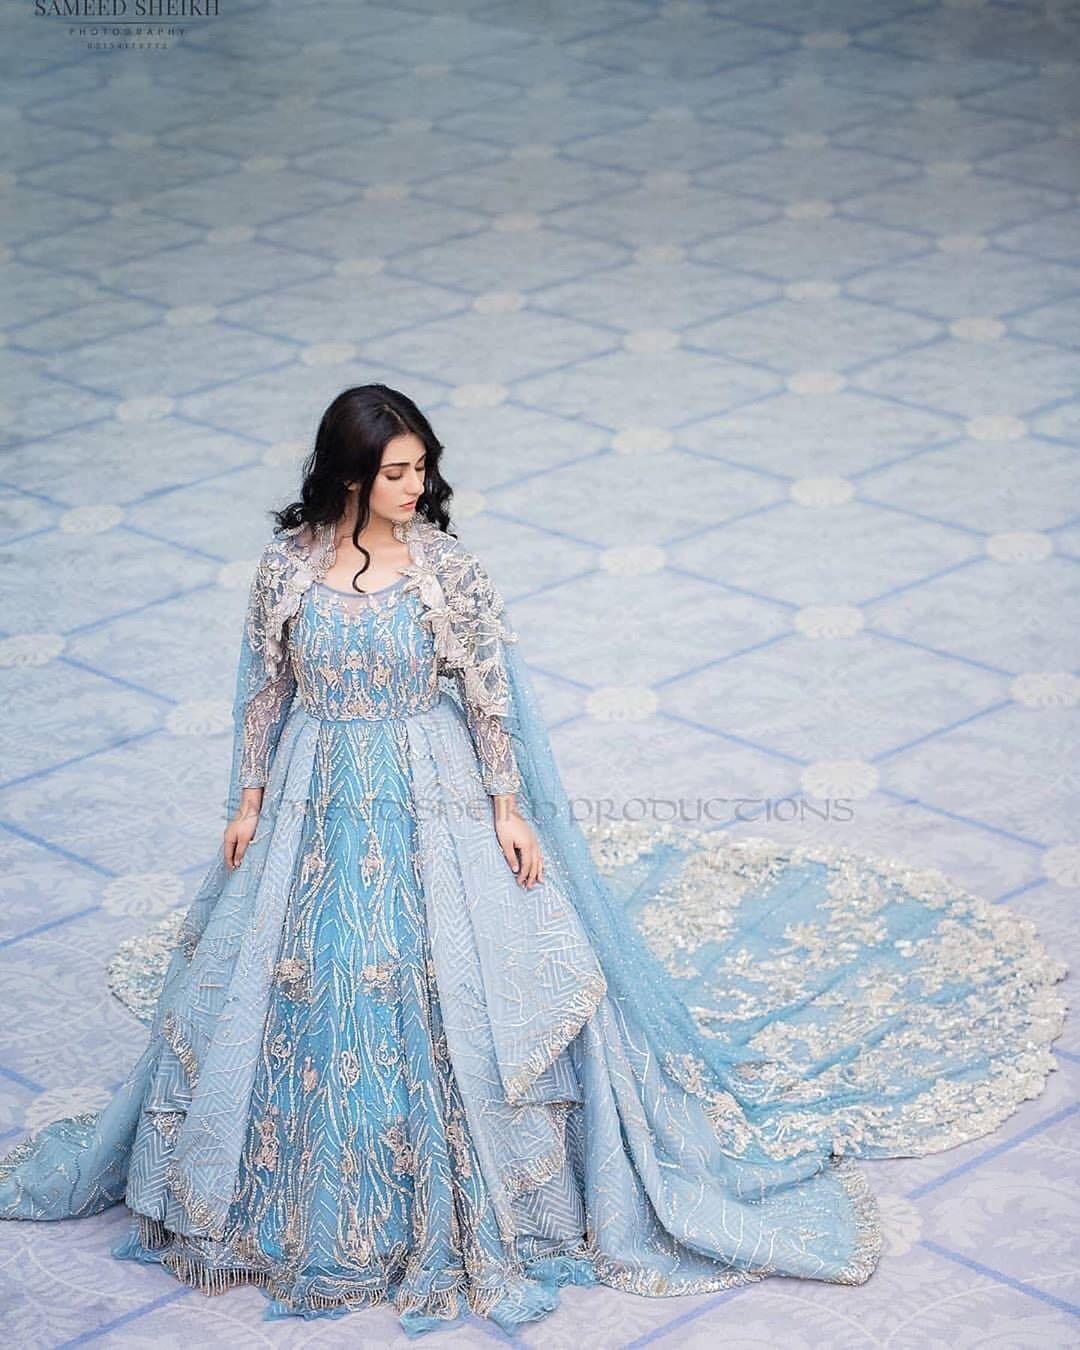 Pakistani Model Sarah Khan Photoshoot (2)